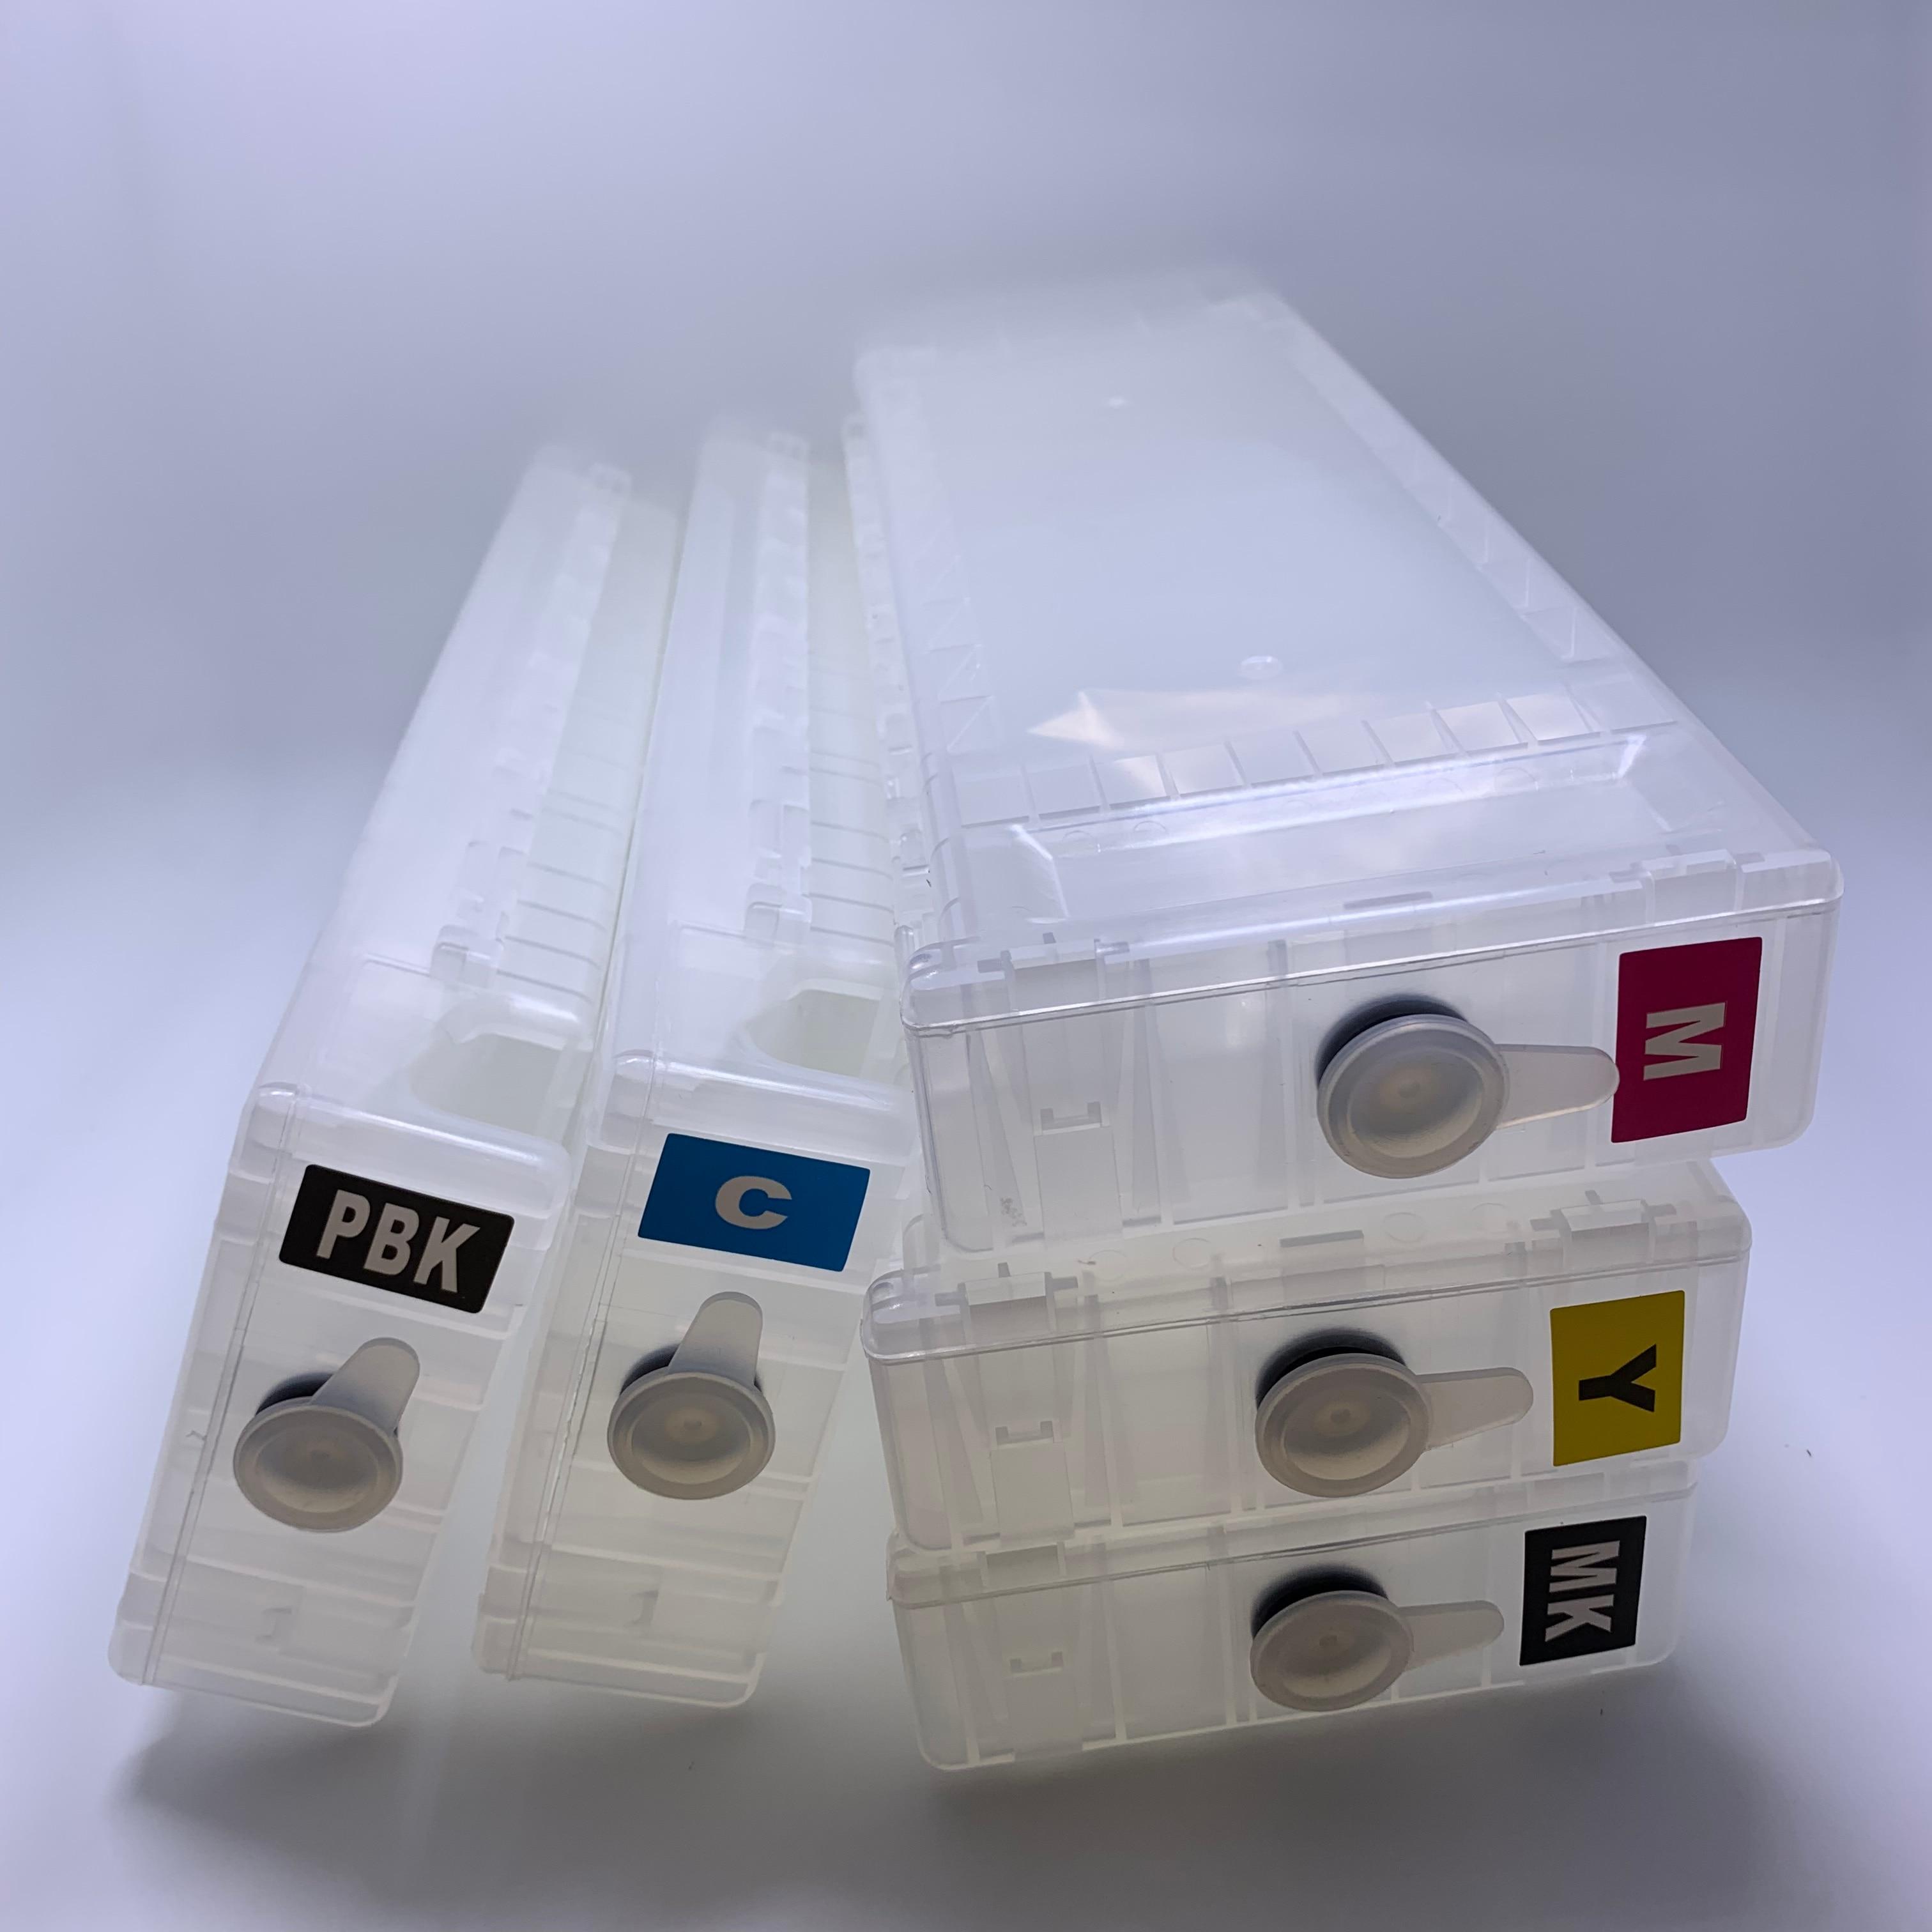 YOTAT 5pcs T6941 for Epson SureColor T7200 T5200 T3200 T7270 T5270 T3270 T7280 T5280 T3280 Printer enlarge